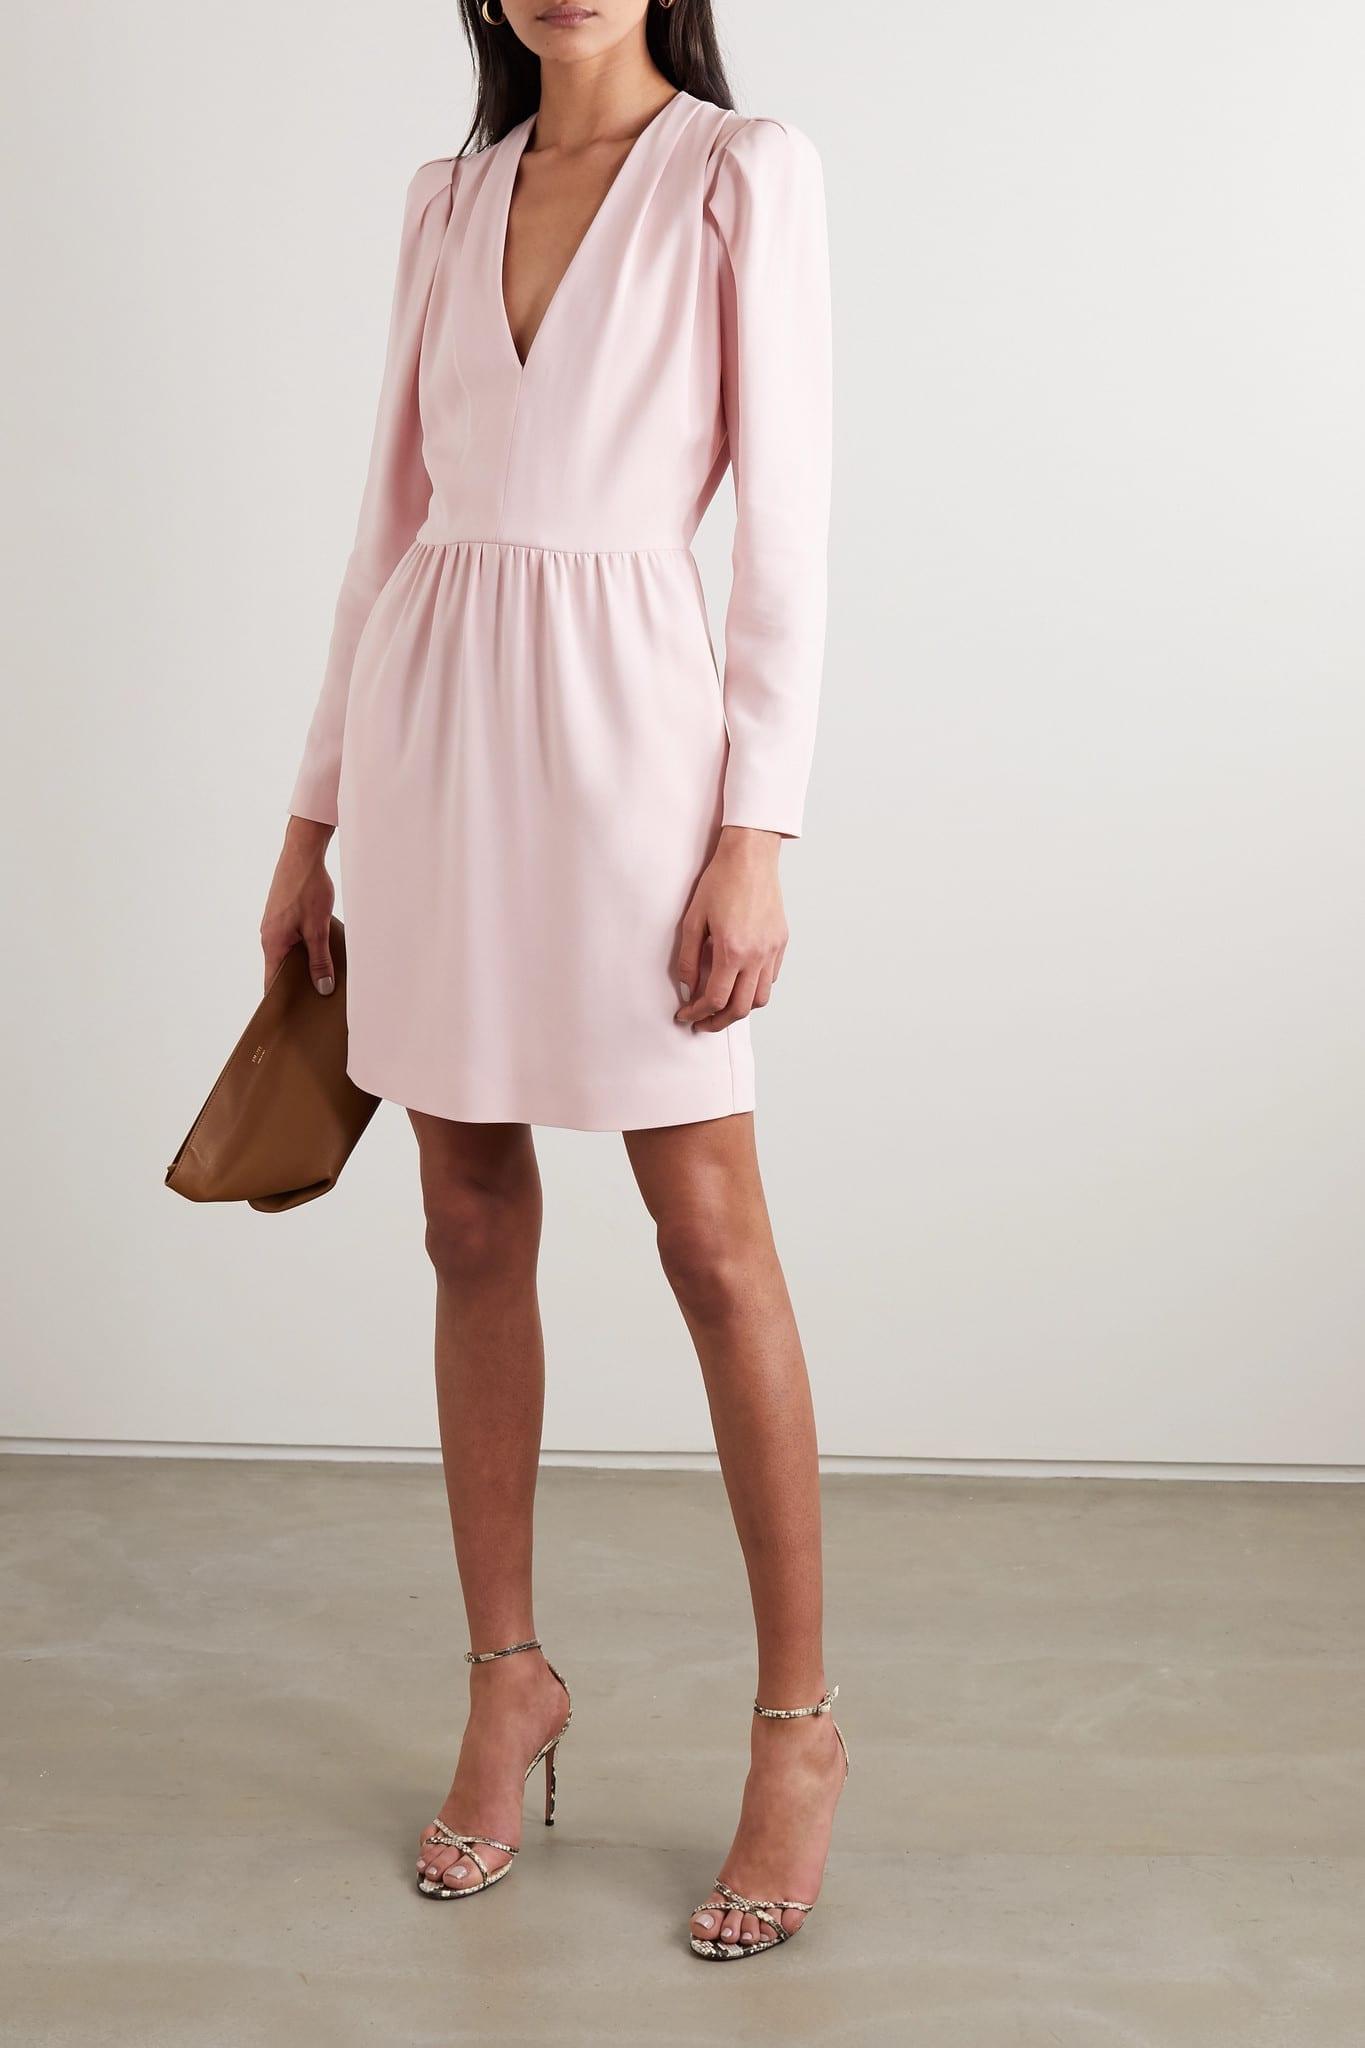 STELLA MCCARTNEY + Net Sustain Stretch-cady Mini Dress